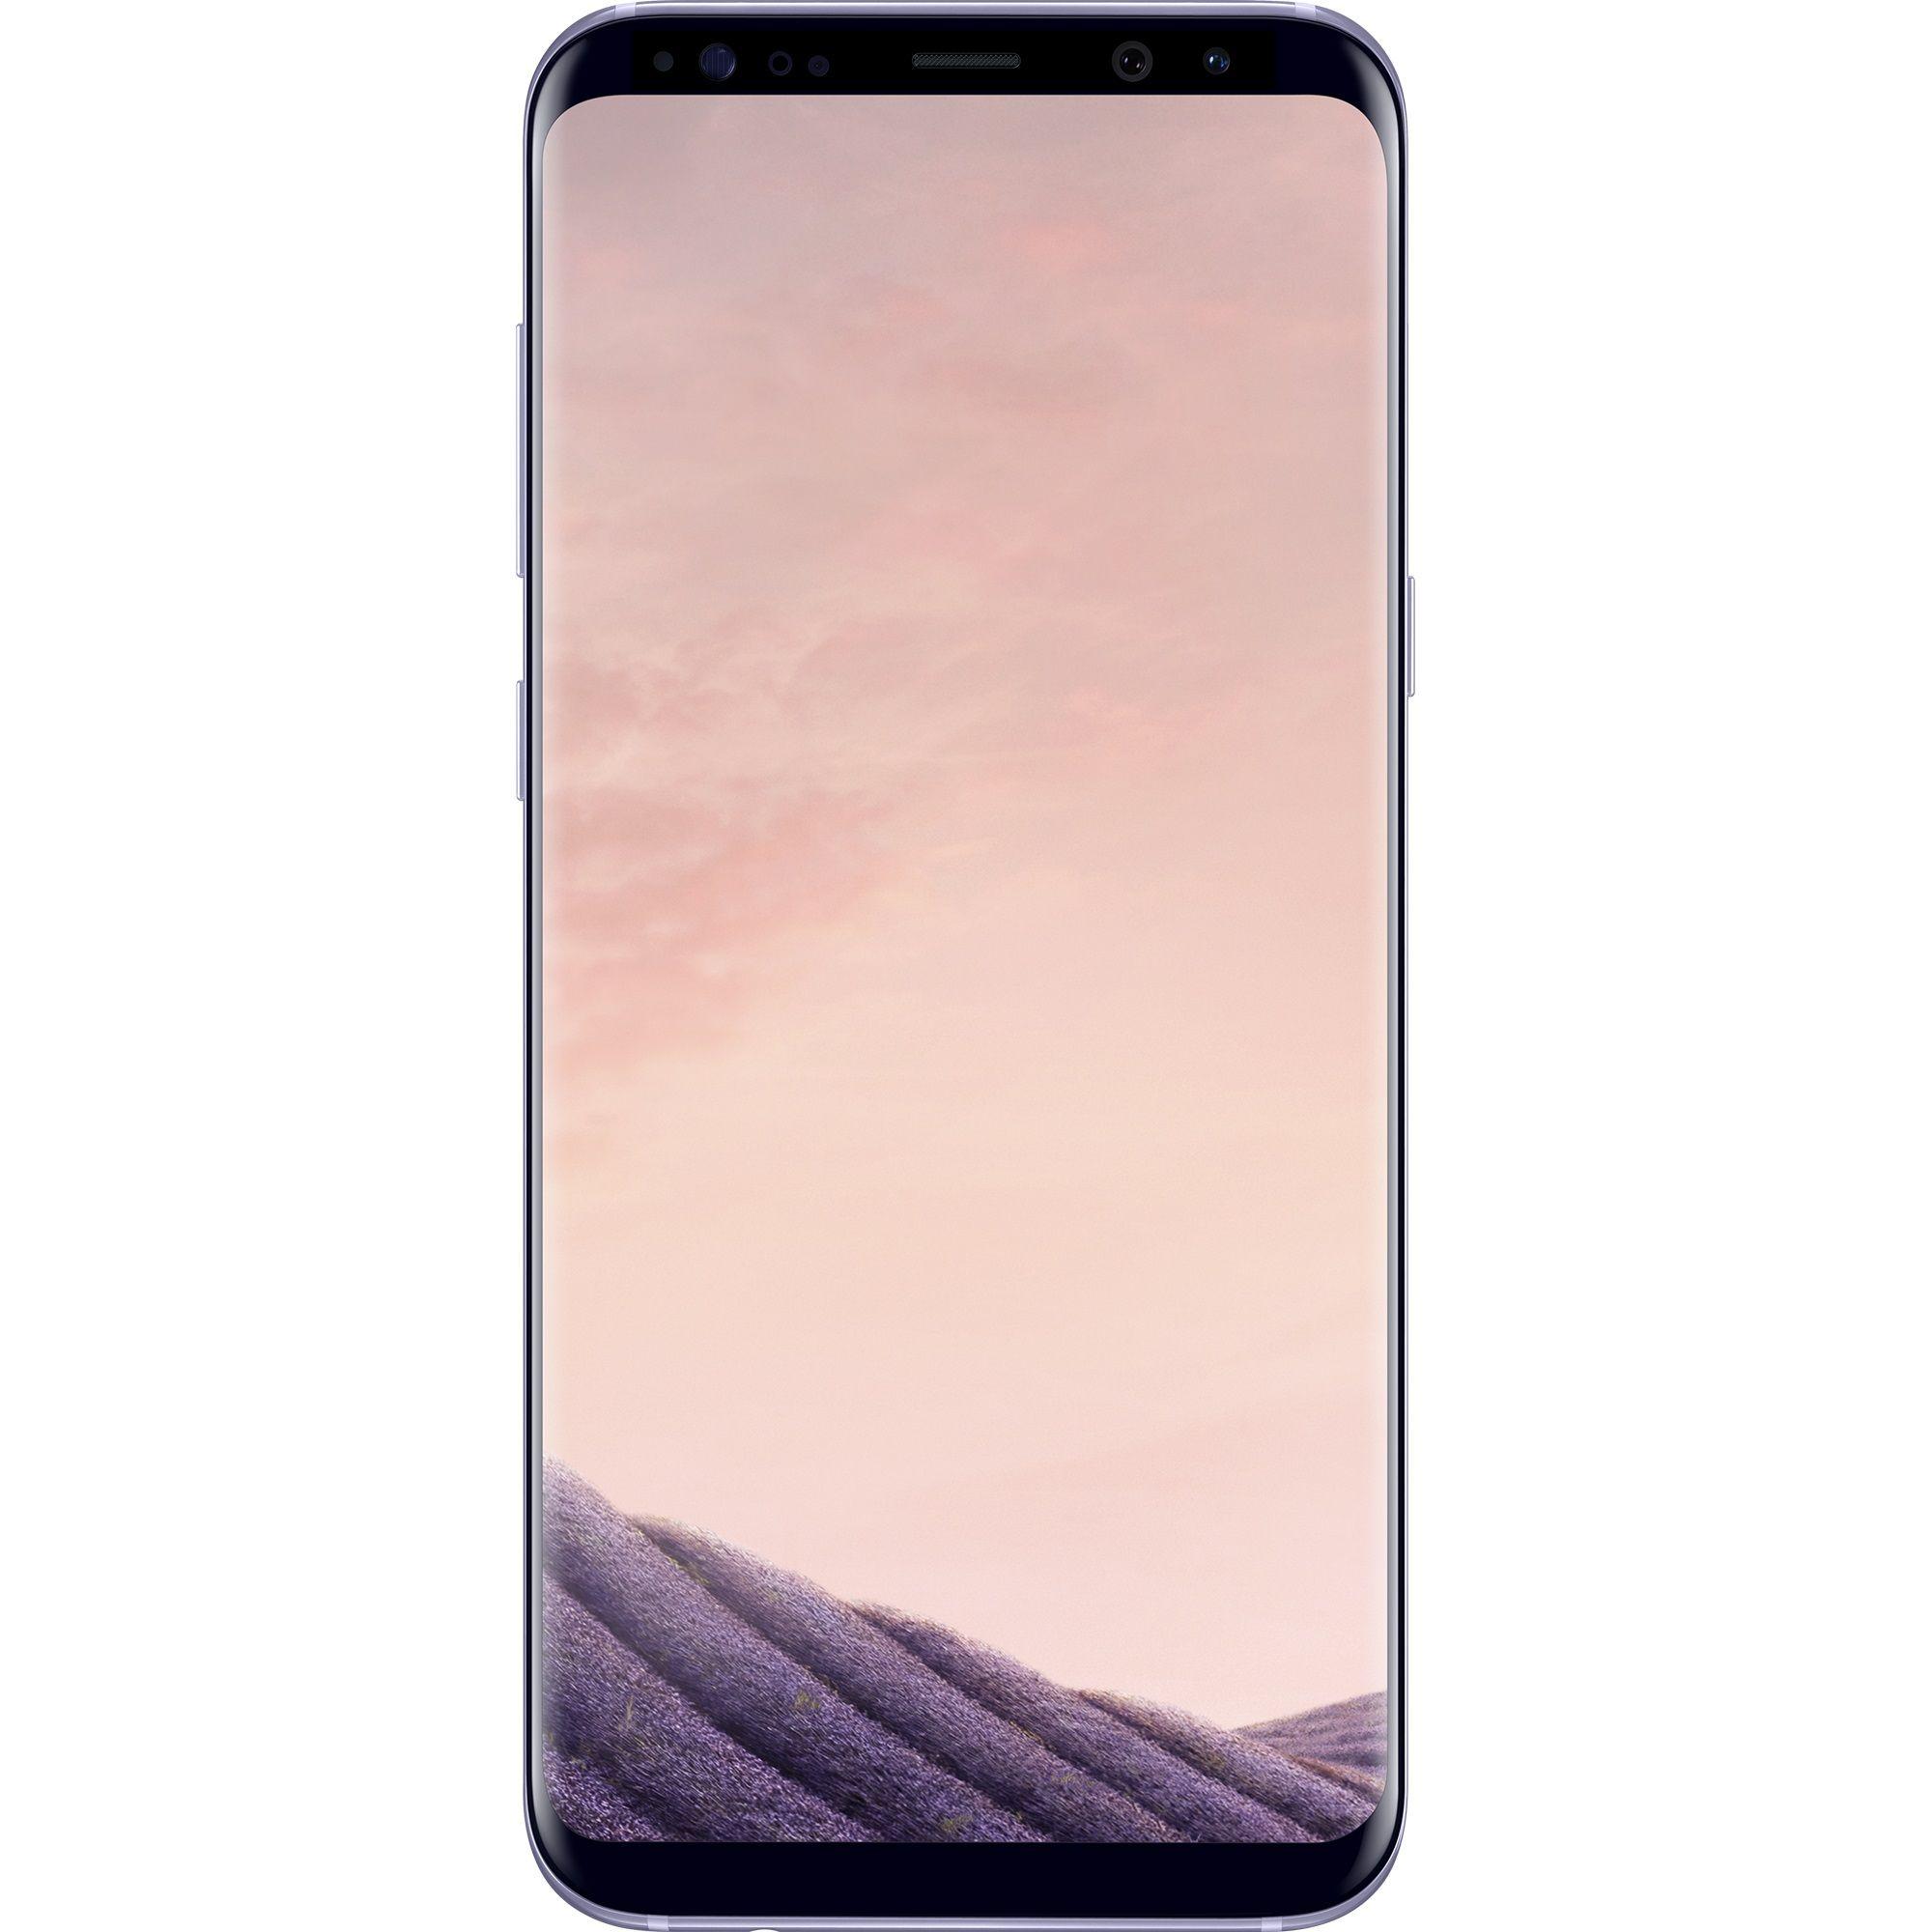 Telefon Mobil Samsung Galaxy S8 Plus G955 64GB Flash 4GB RAM Single SIM 4G Orchid Grey